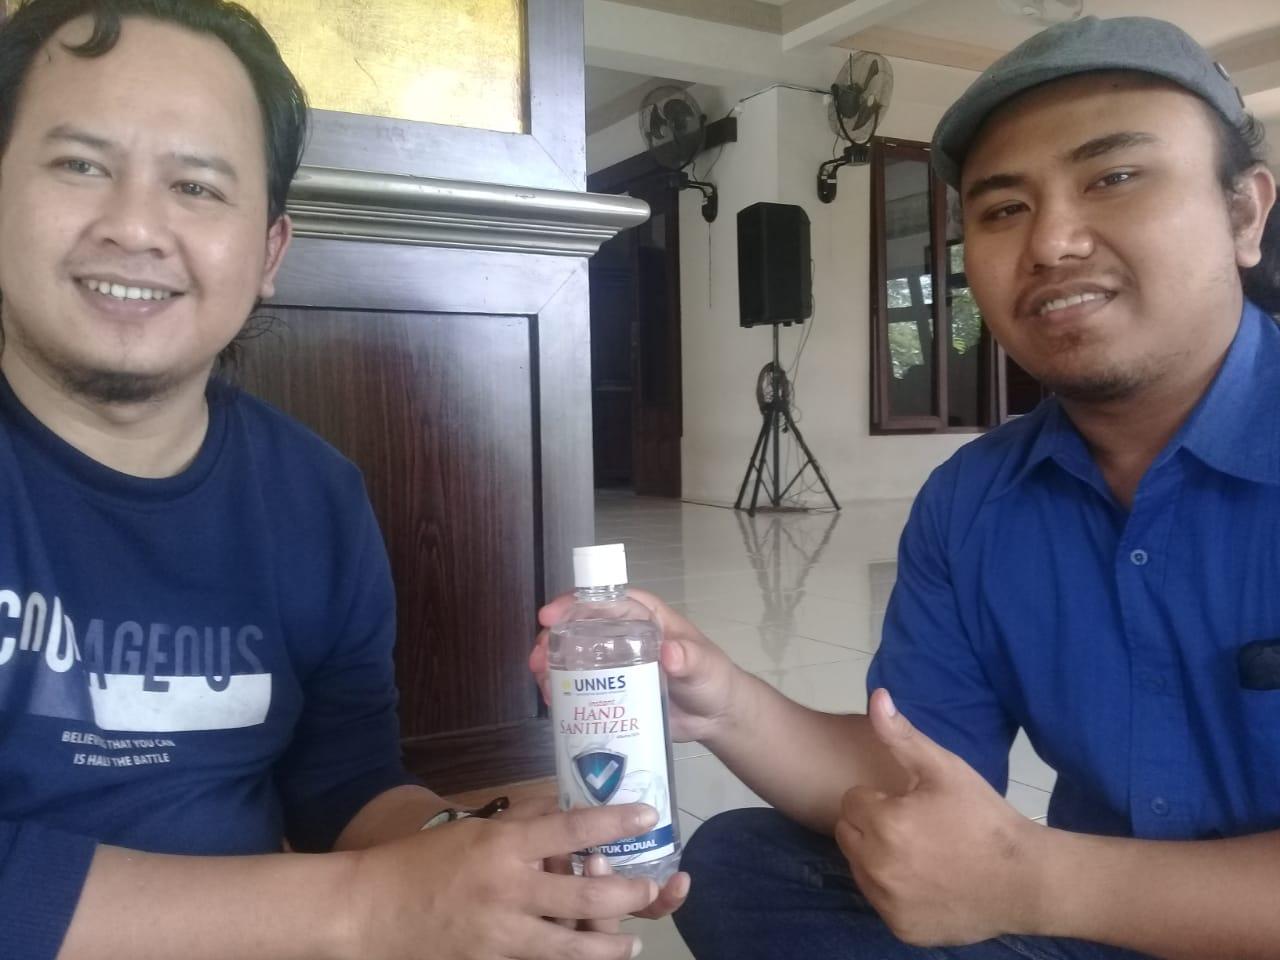 UNNES Berikan Handsanitizer Kepada Masyarakat Lingkar Kampus